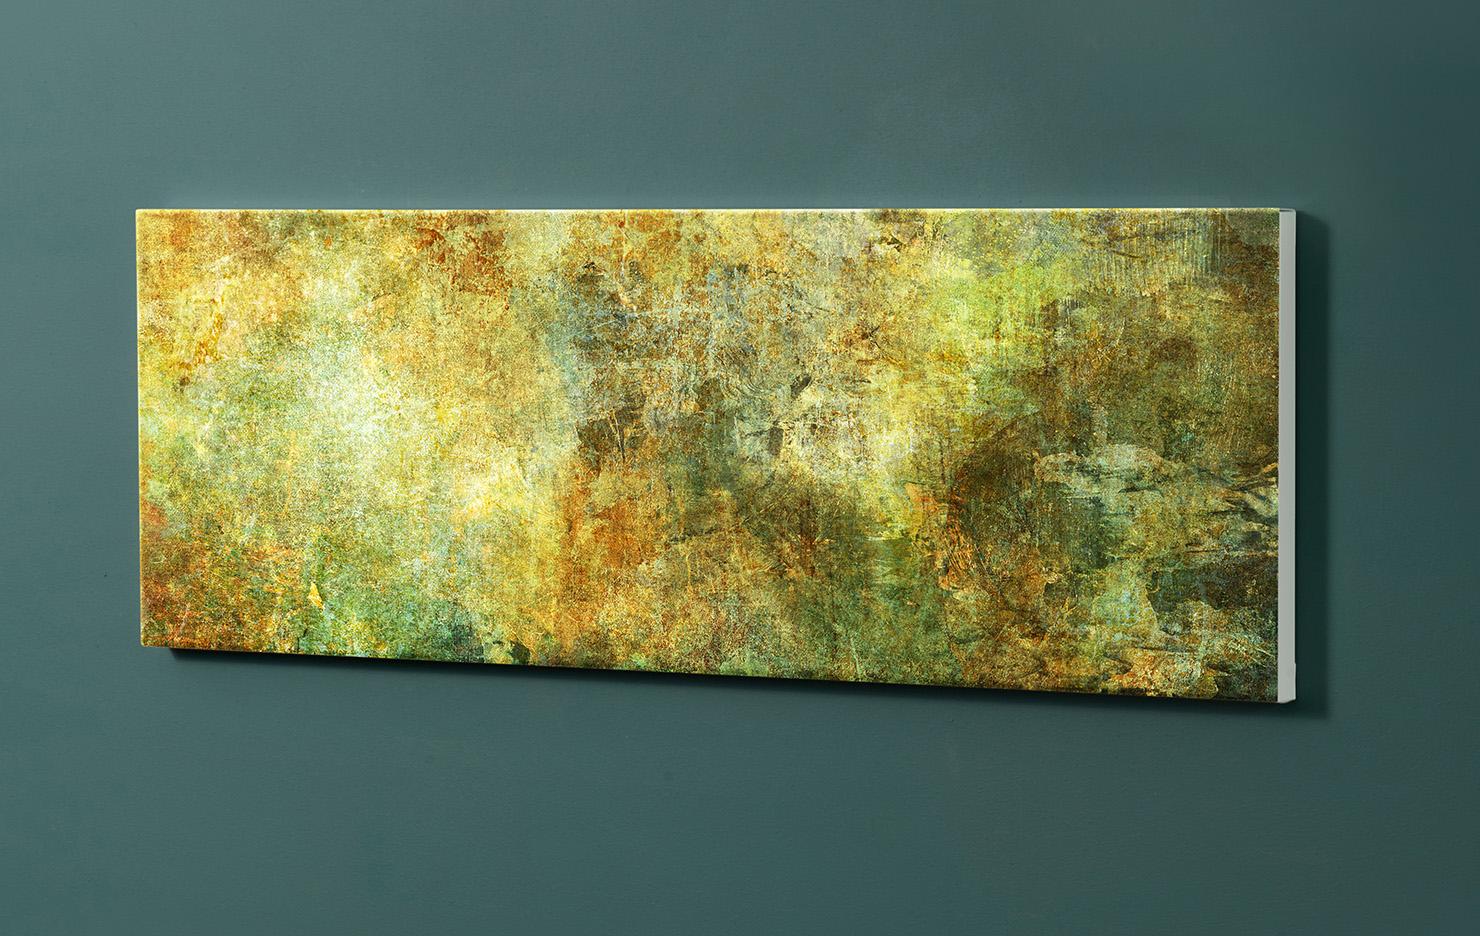 Magnettafel NOTIZ 90x30cm Motiv-Pinnwand M110 Abstrakt Kunst